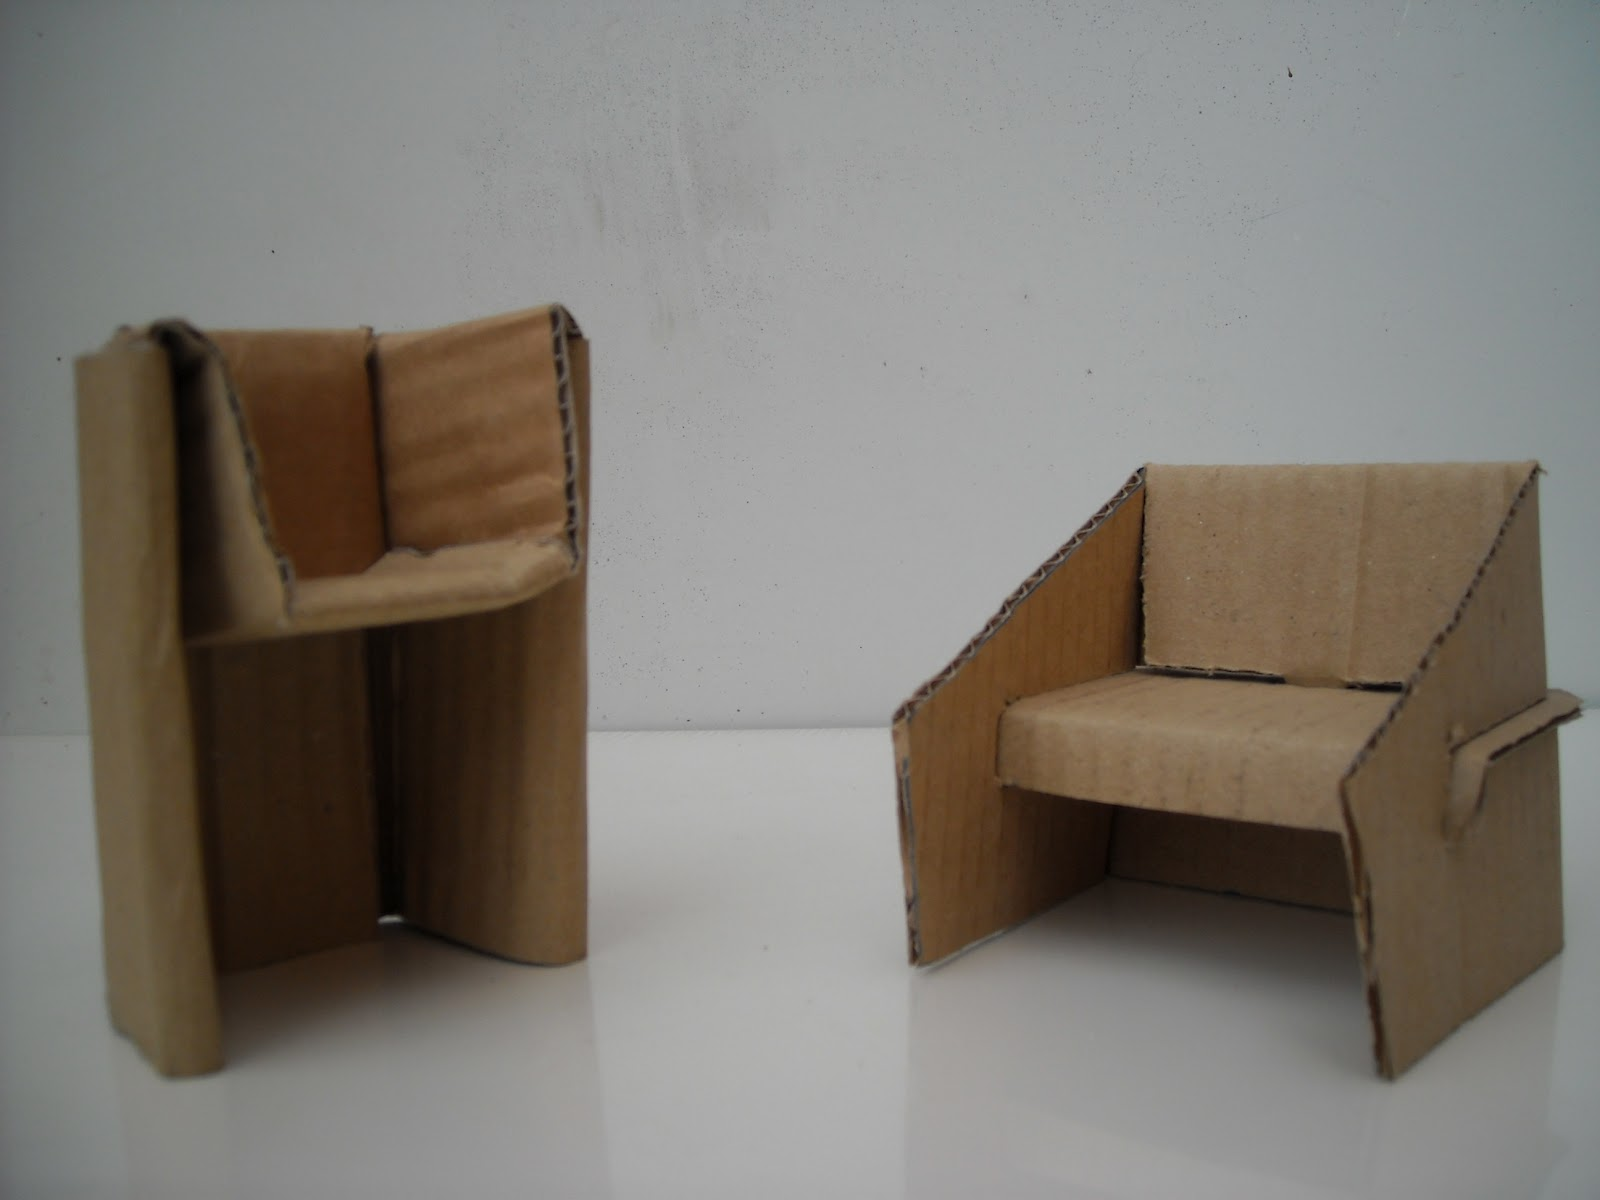 dise iko mobiliario de cart n